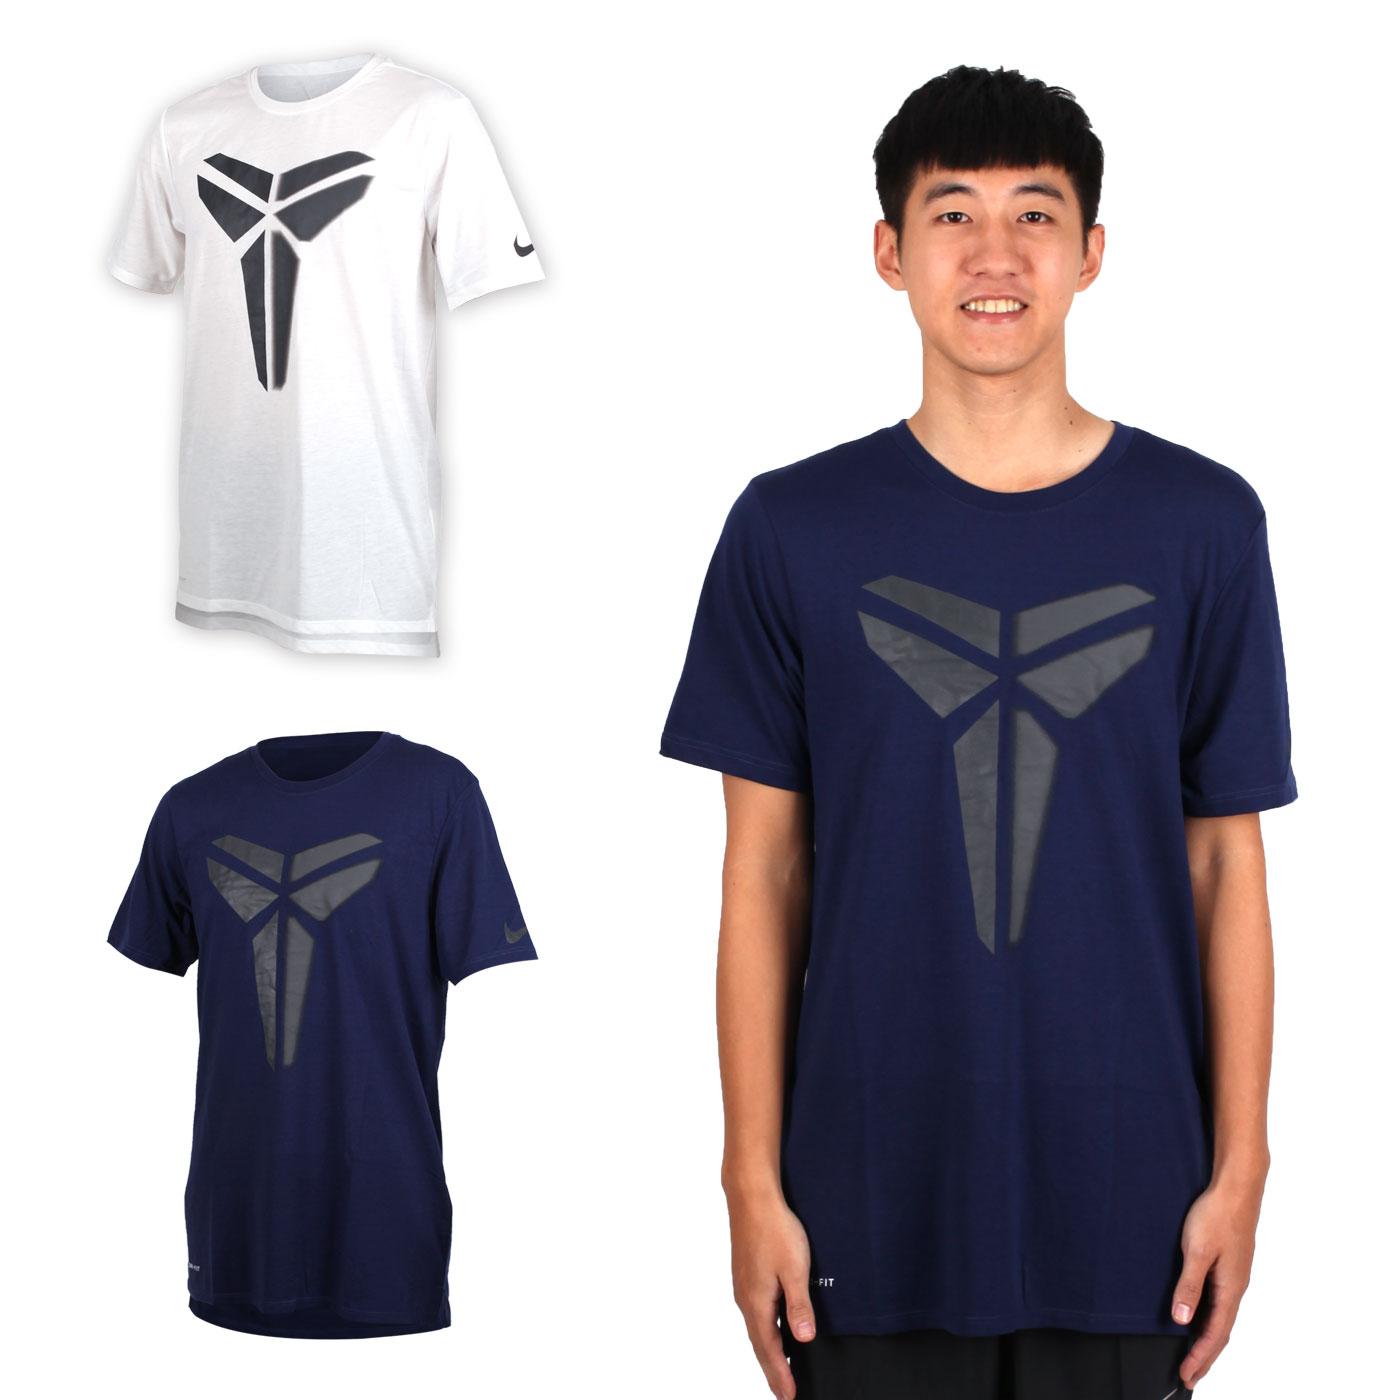 NIKE 男針織短袖上衣 (T恤 短T 籃球 NBA Kobe Bryant 柯比【03312743】≡排汗專家≡